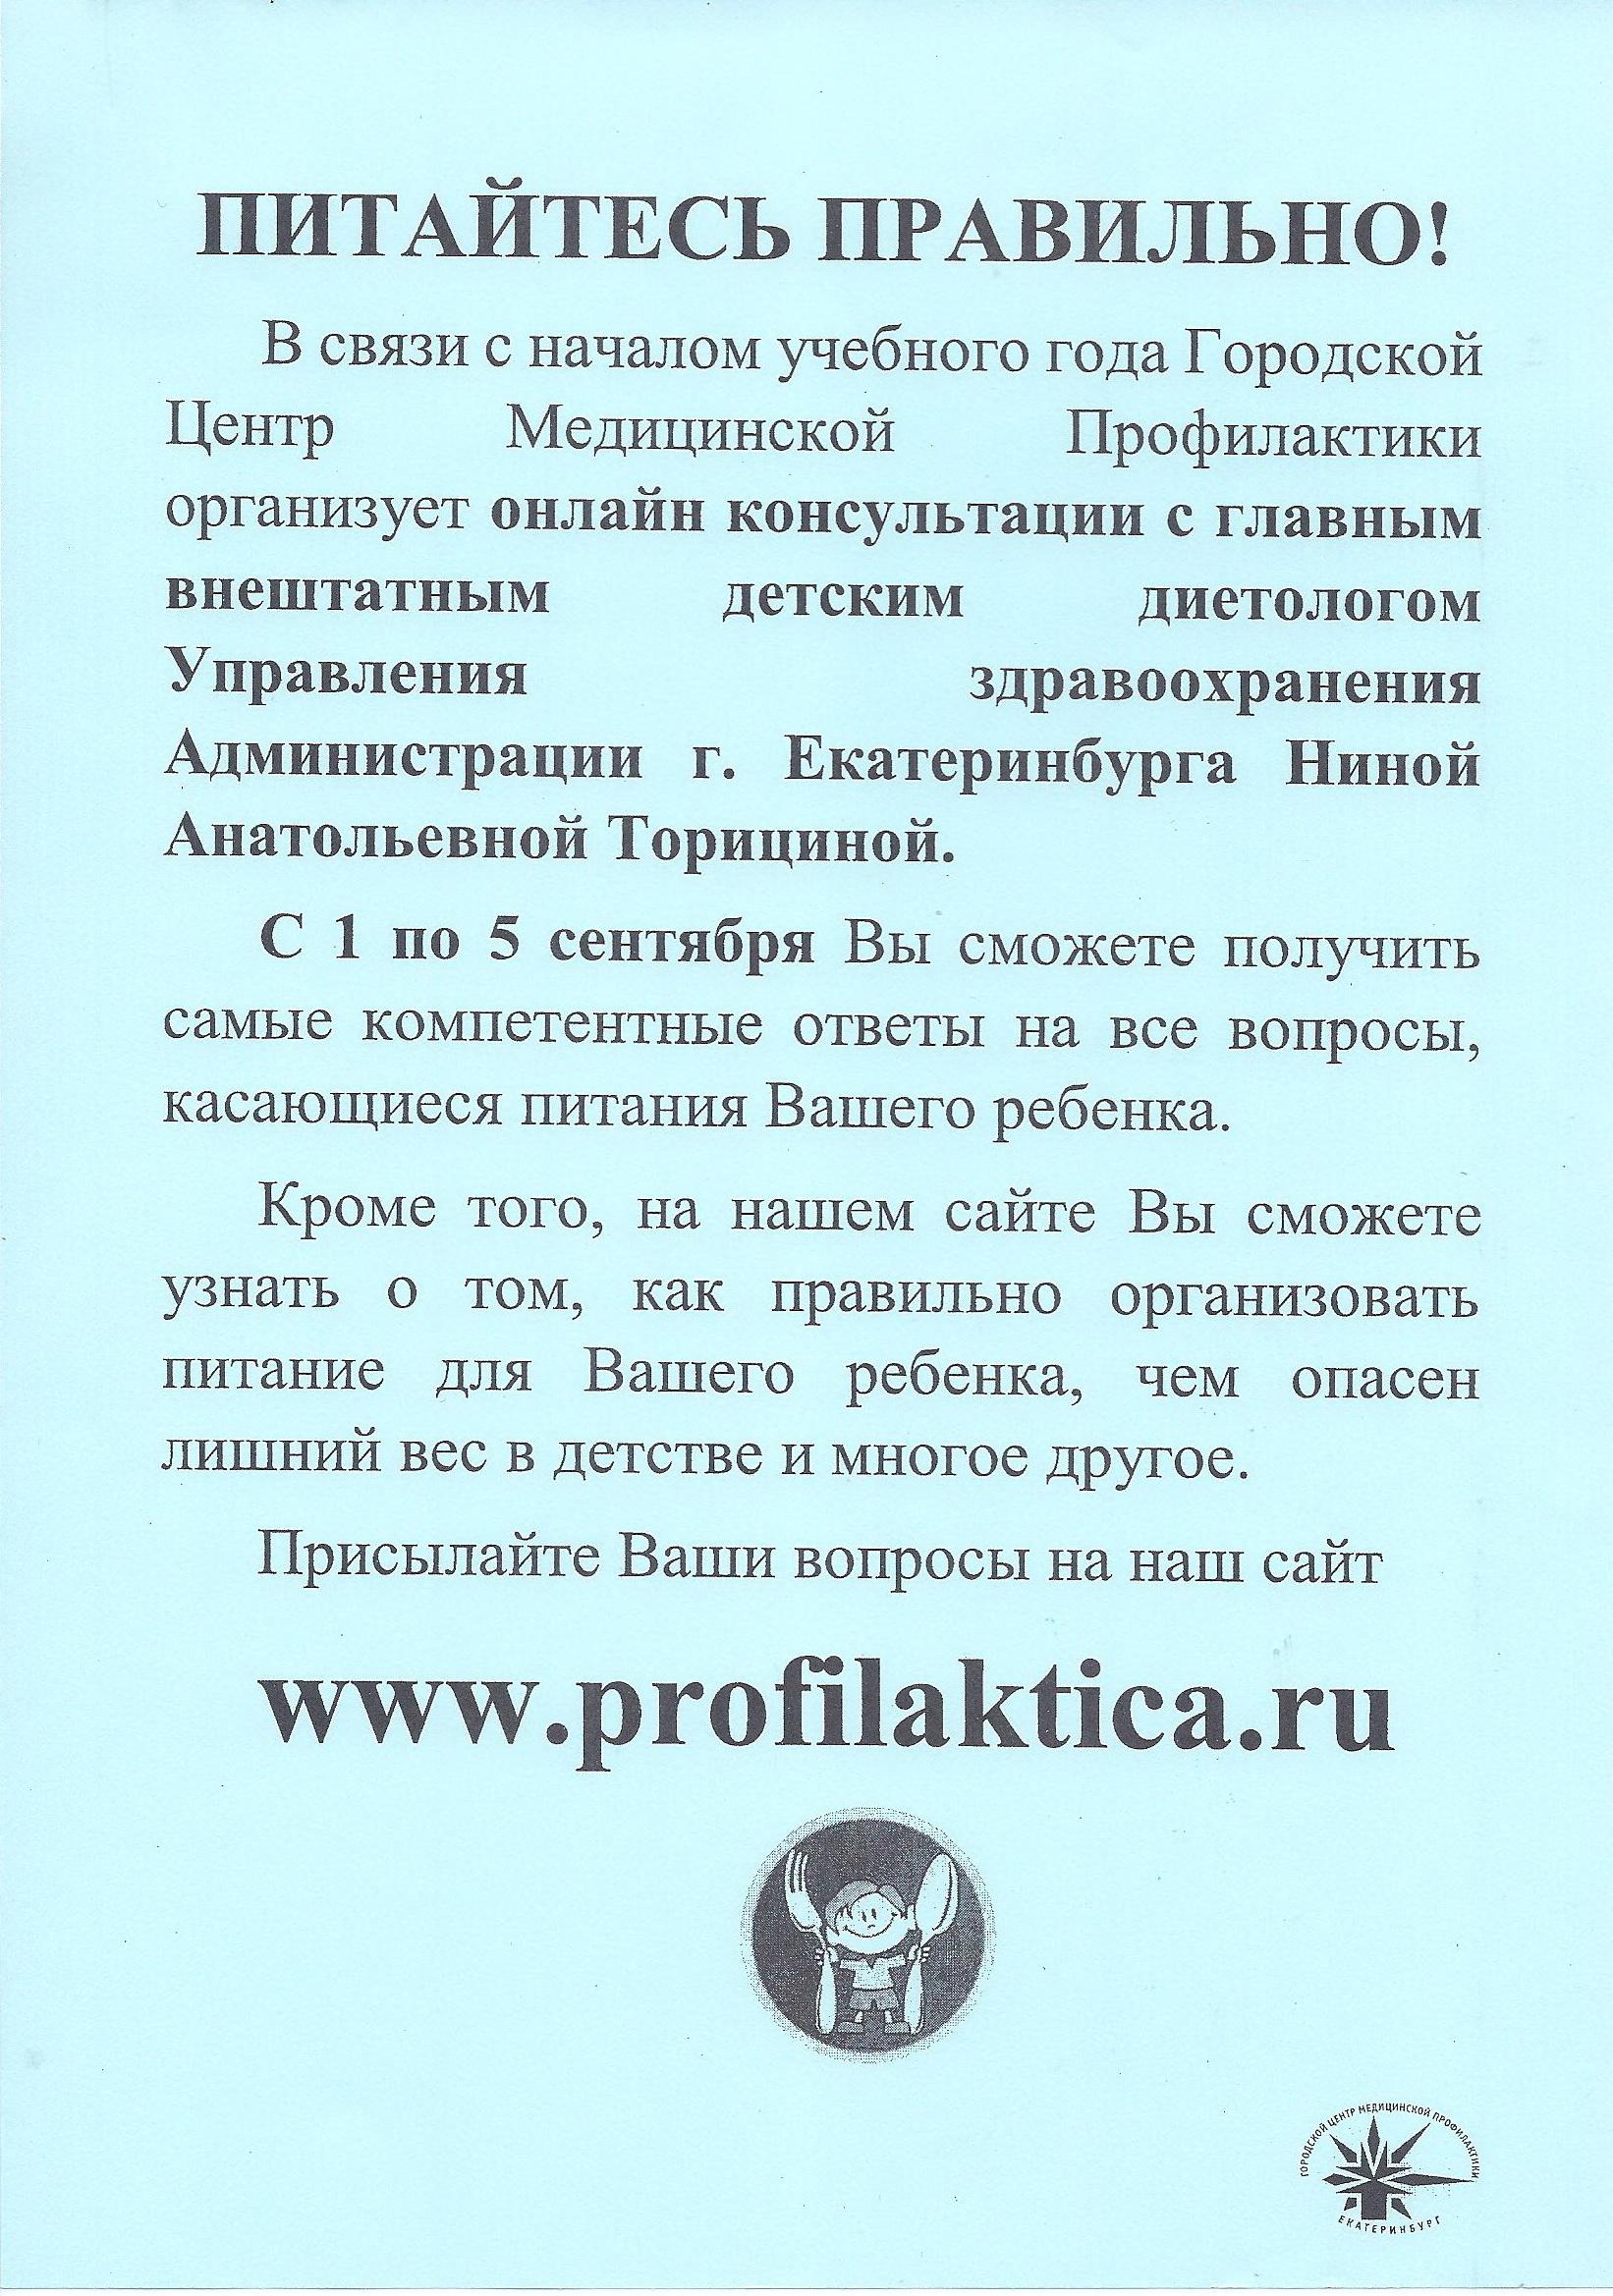 вакансии диетолога в санкт петербурге